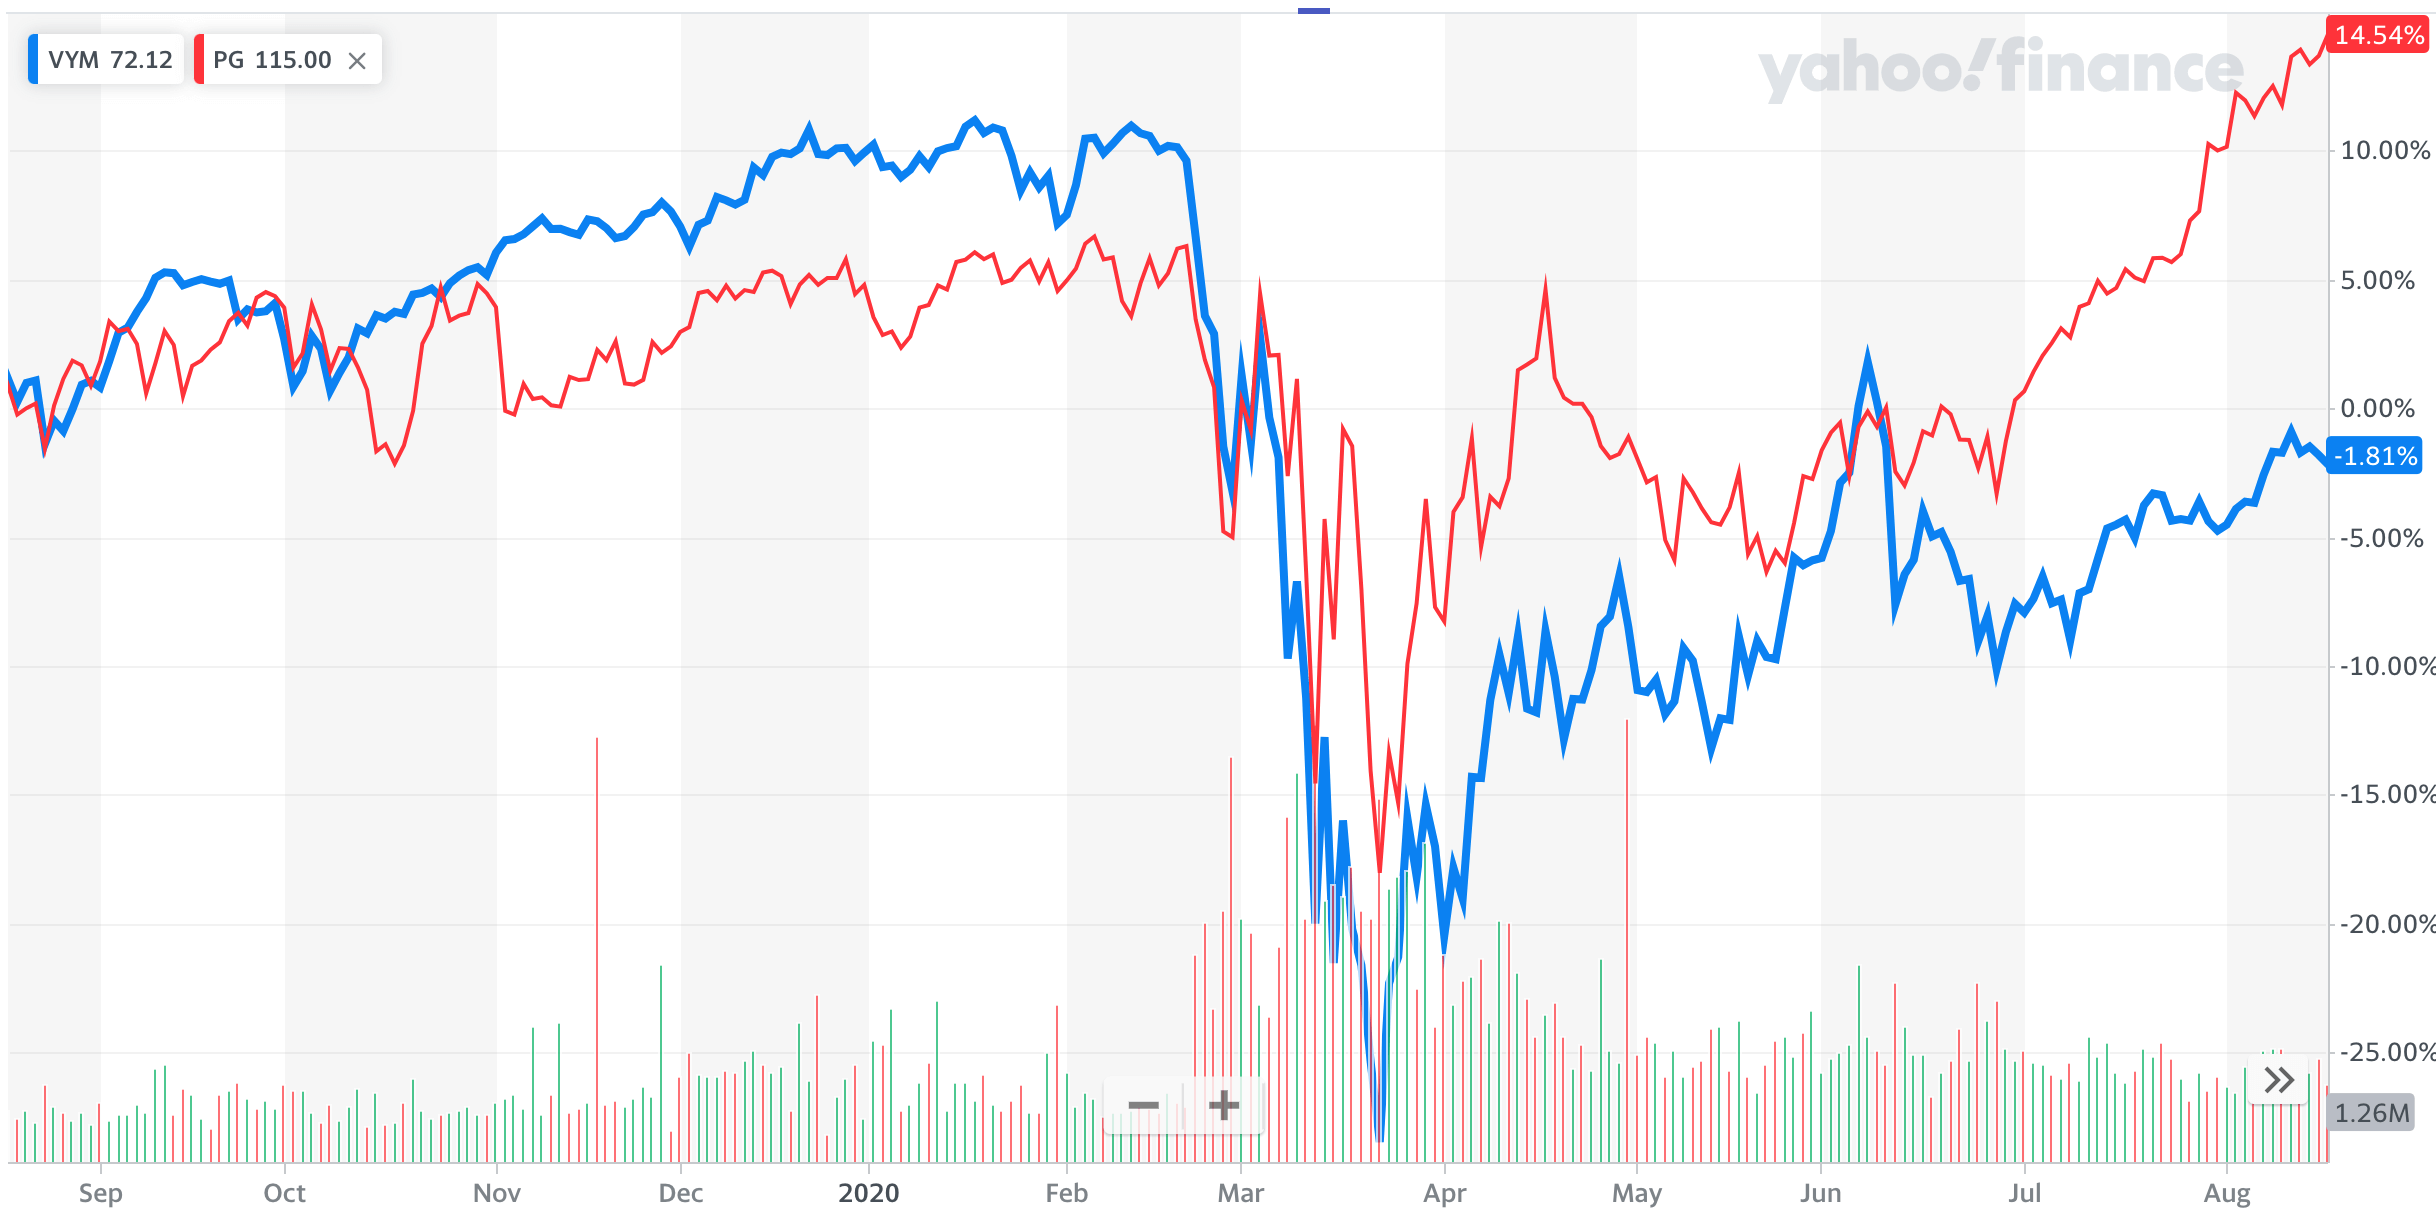 VYM・PG比較:コロナショック時のチャート